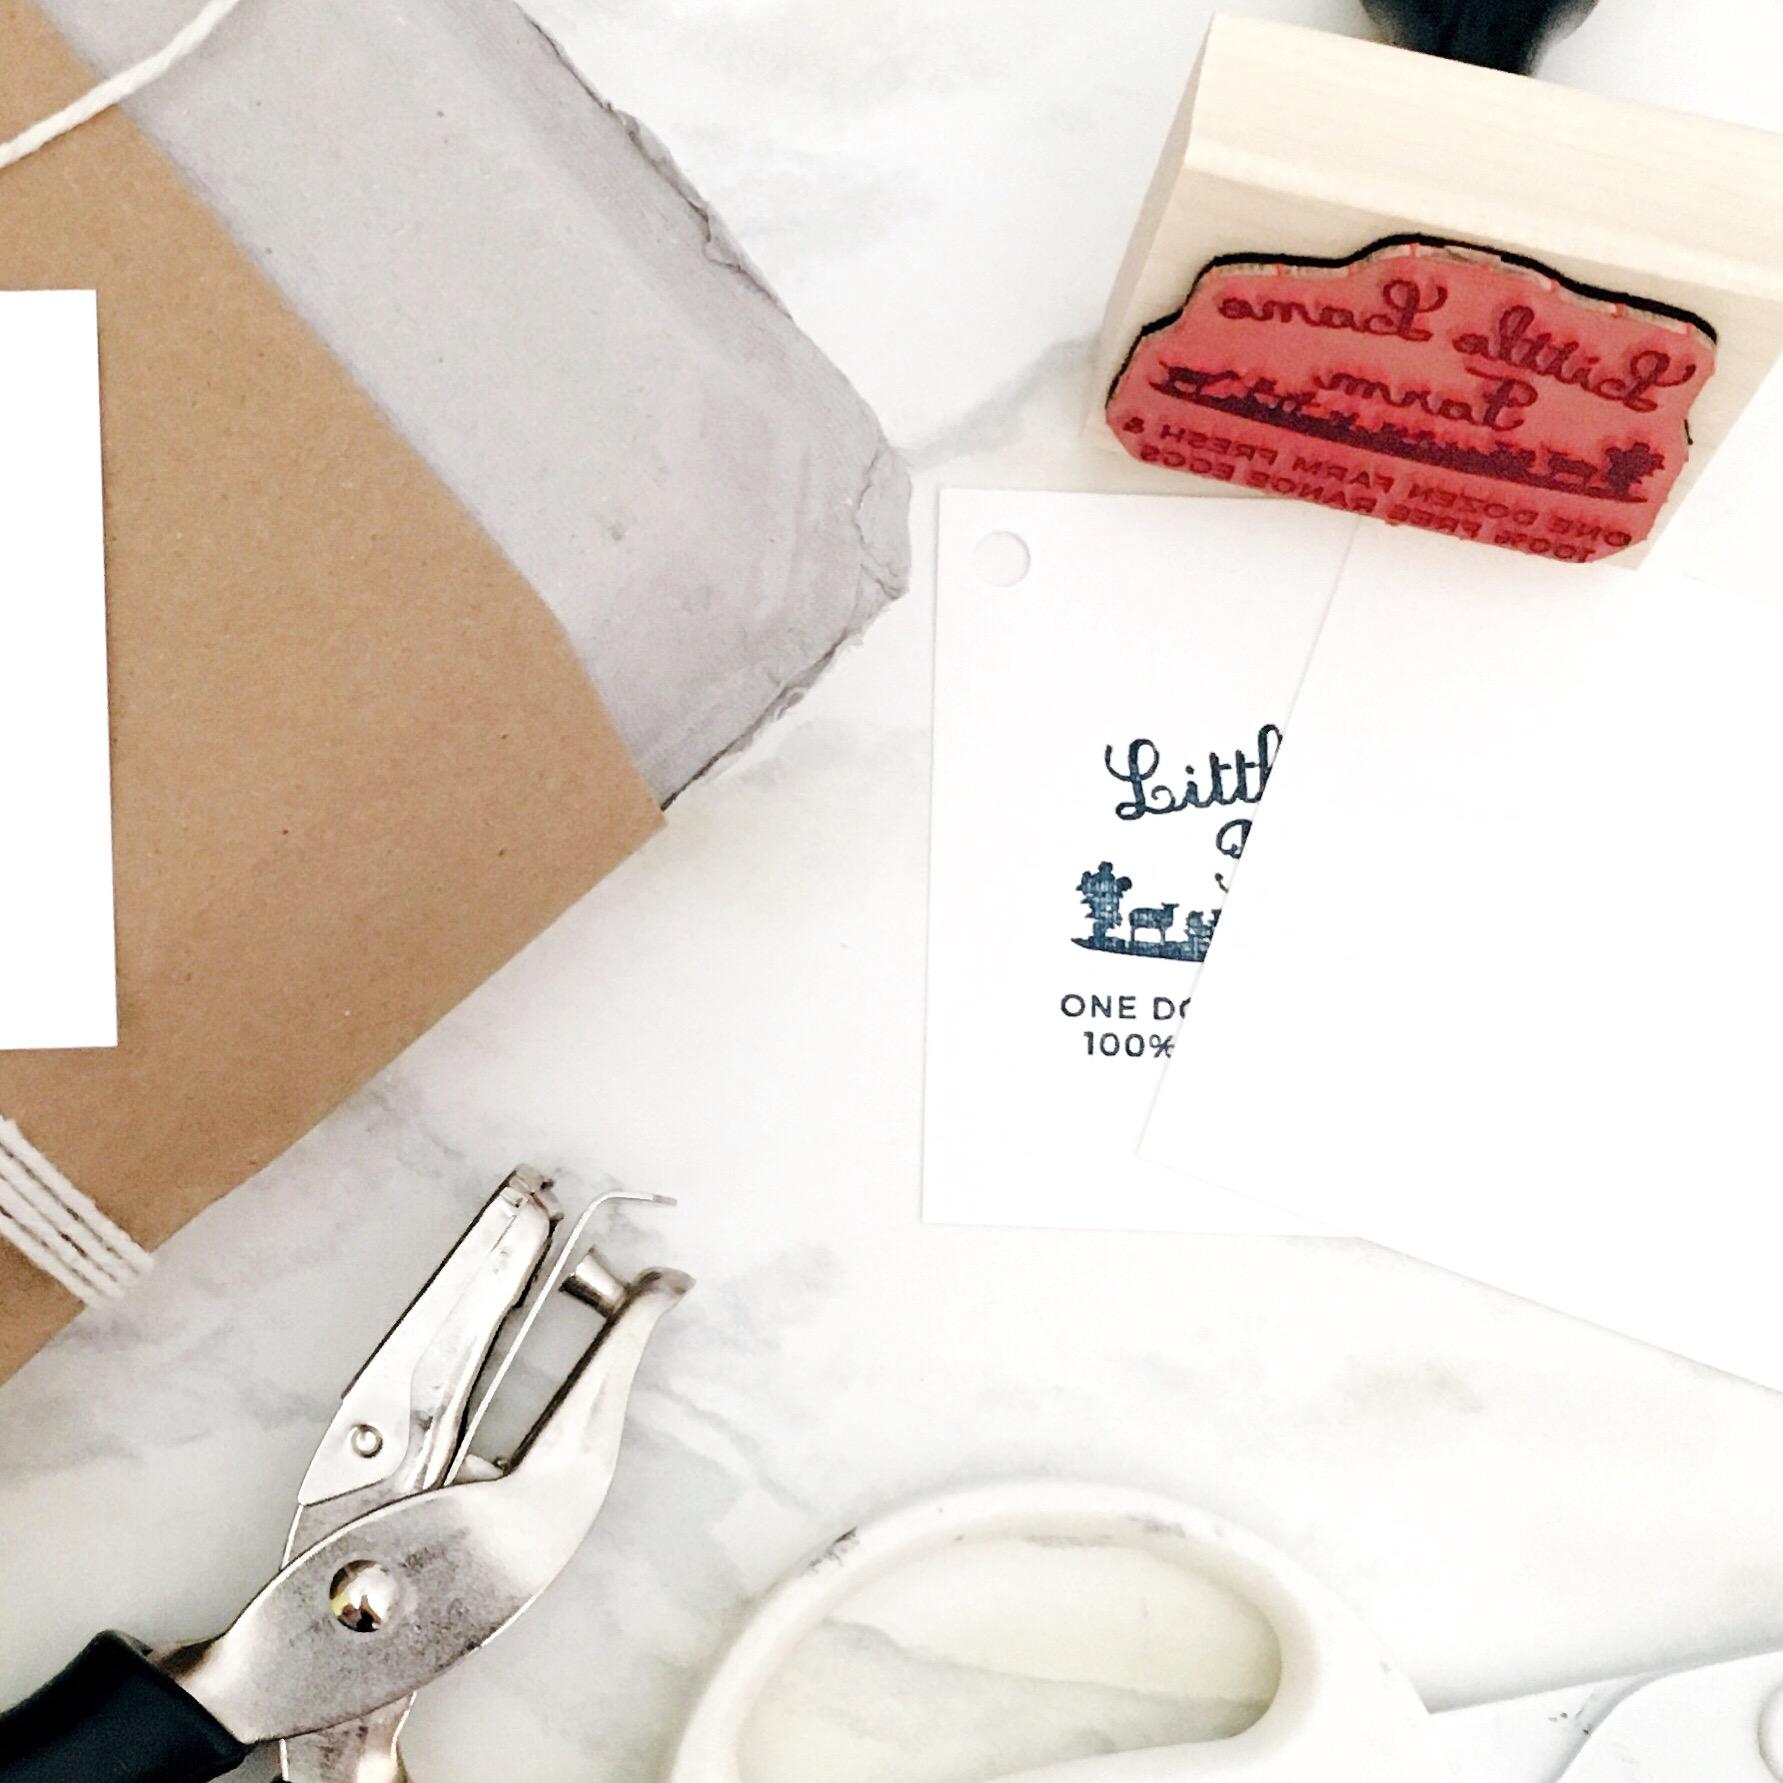 Creatiate Blog- Packaging Project 3 Preview.JPG